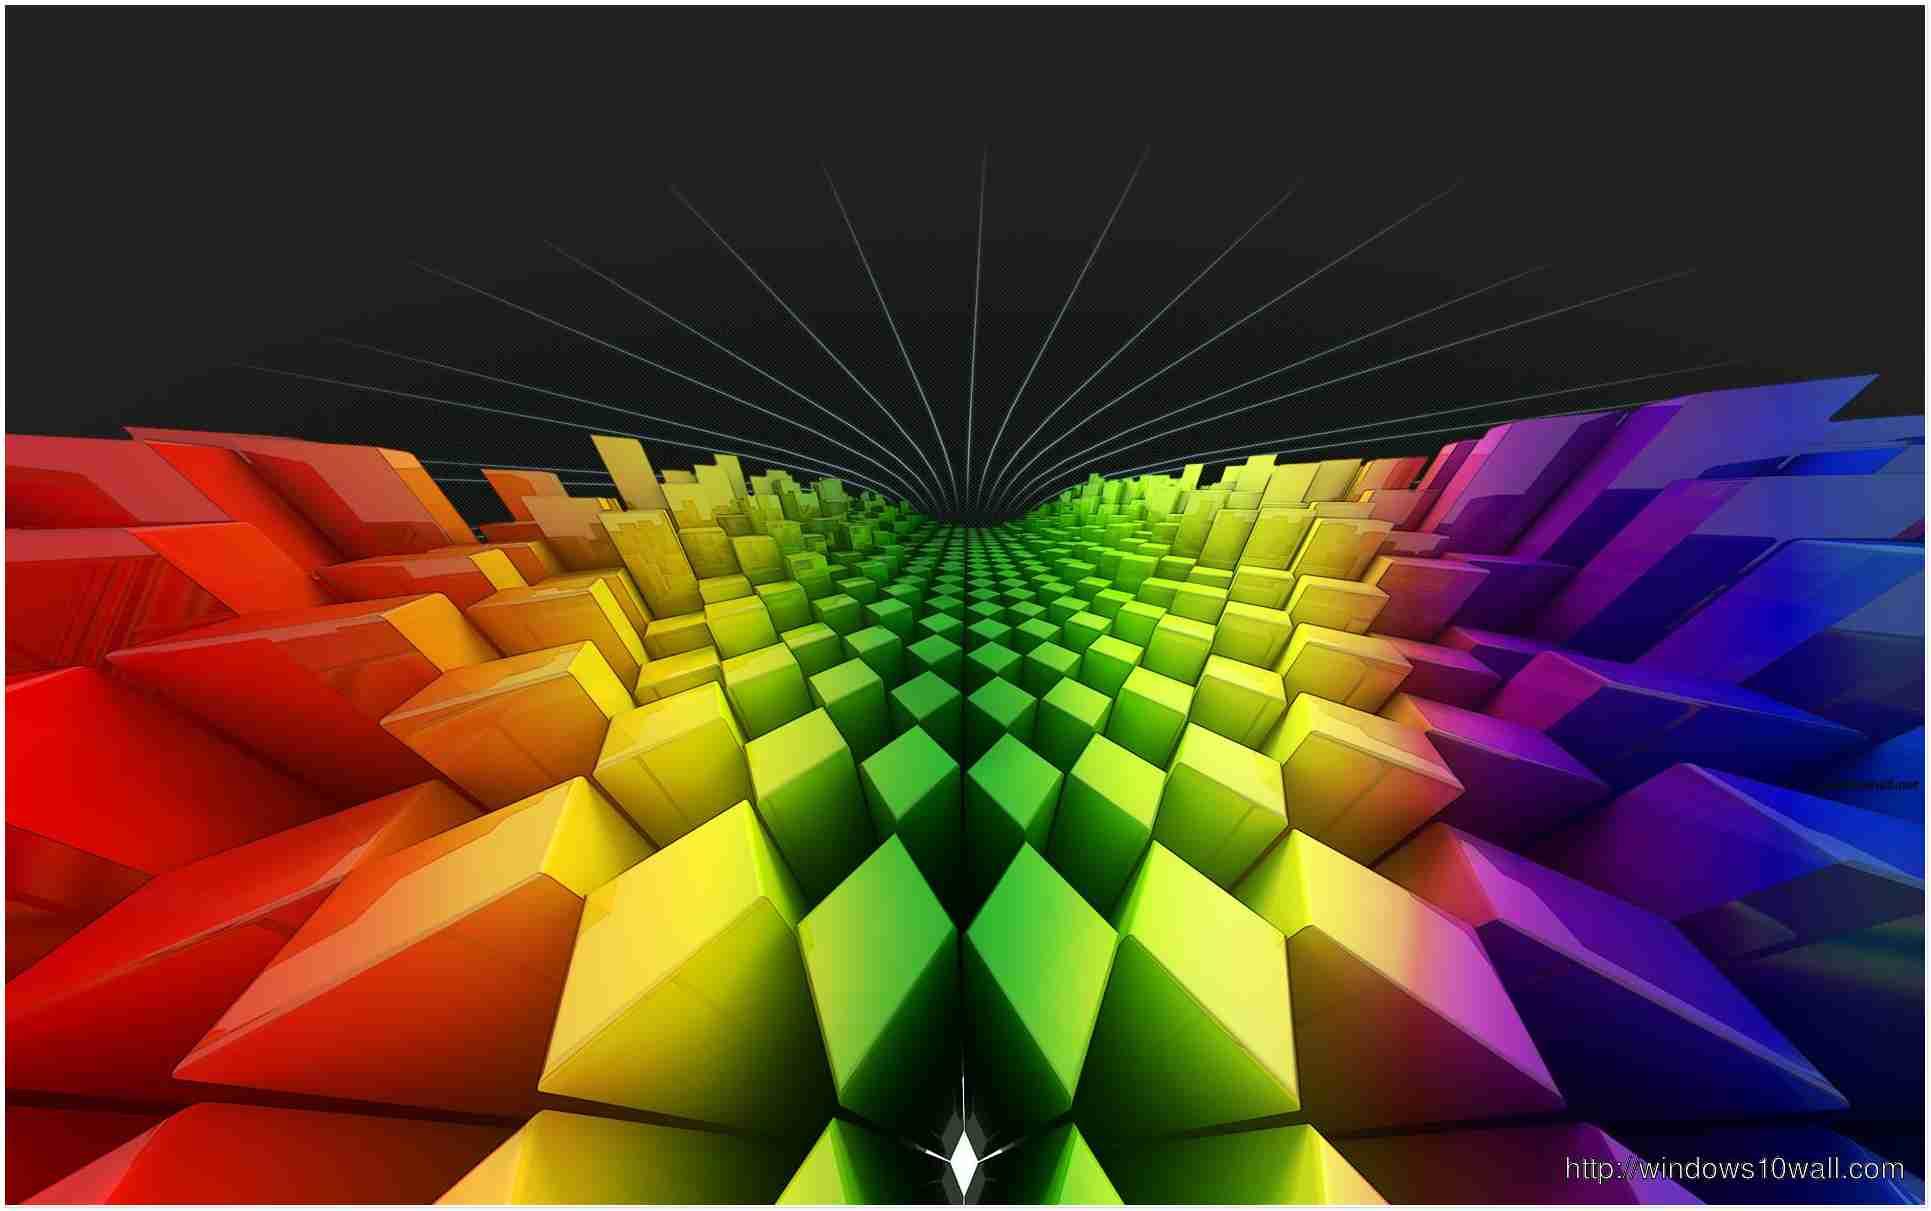 3d Moving Wallpaper For Windows 10 1920x1200 Download Hd Wallpaper Wallpapertip